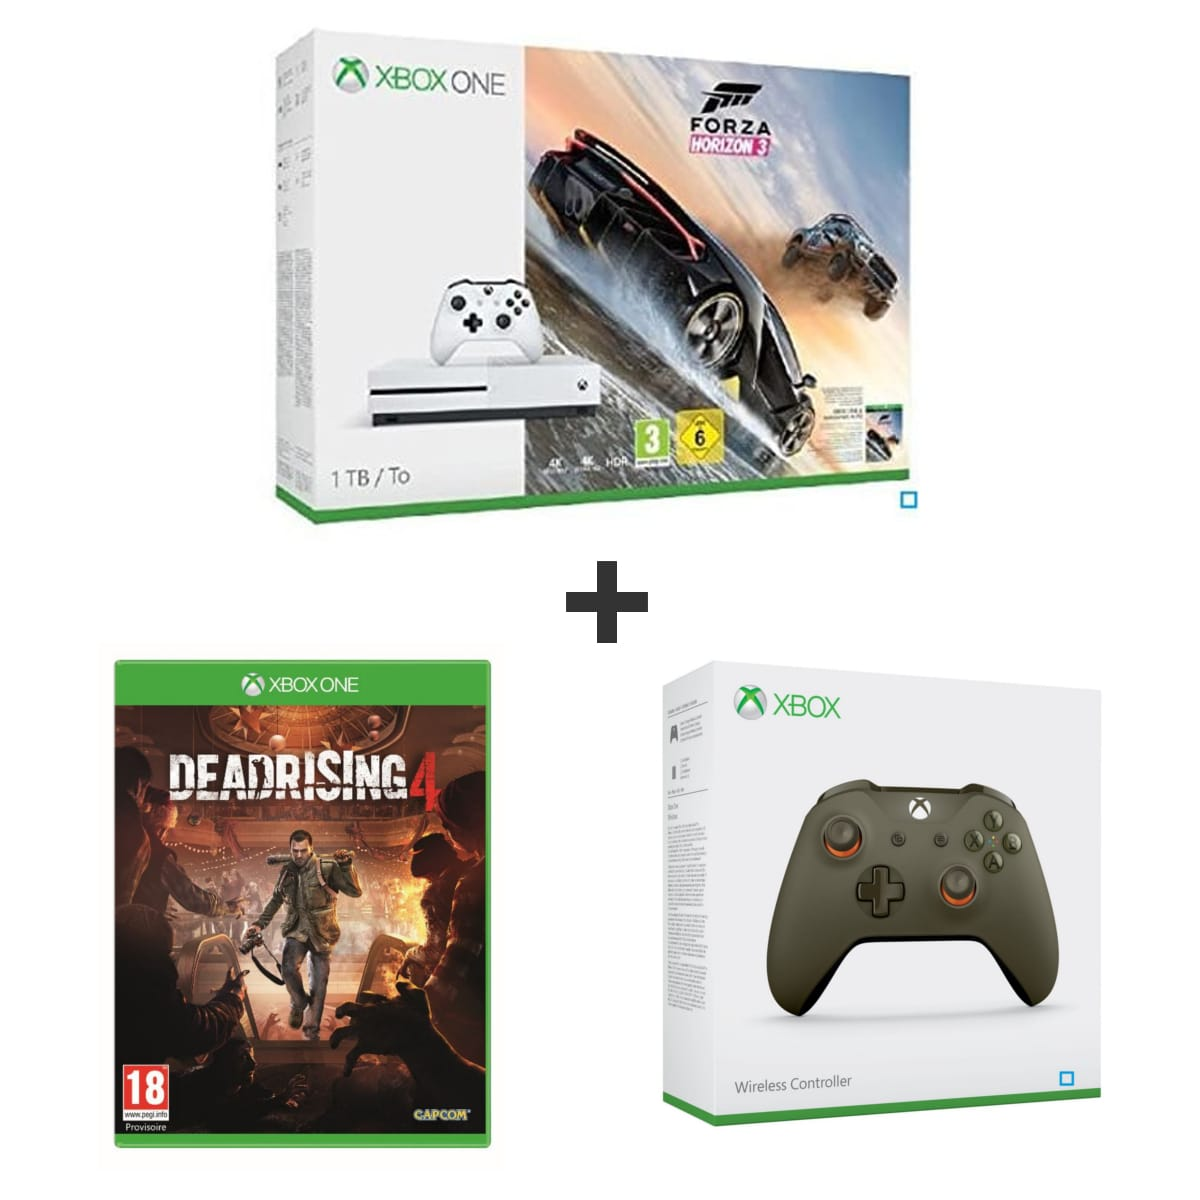 Code promo Auchan : Console Xbox One S 1To + Forza Horizon 3 + Dead rising 4 + 2e manette à 299,99€